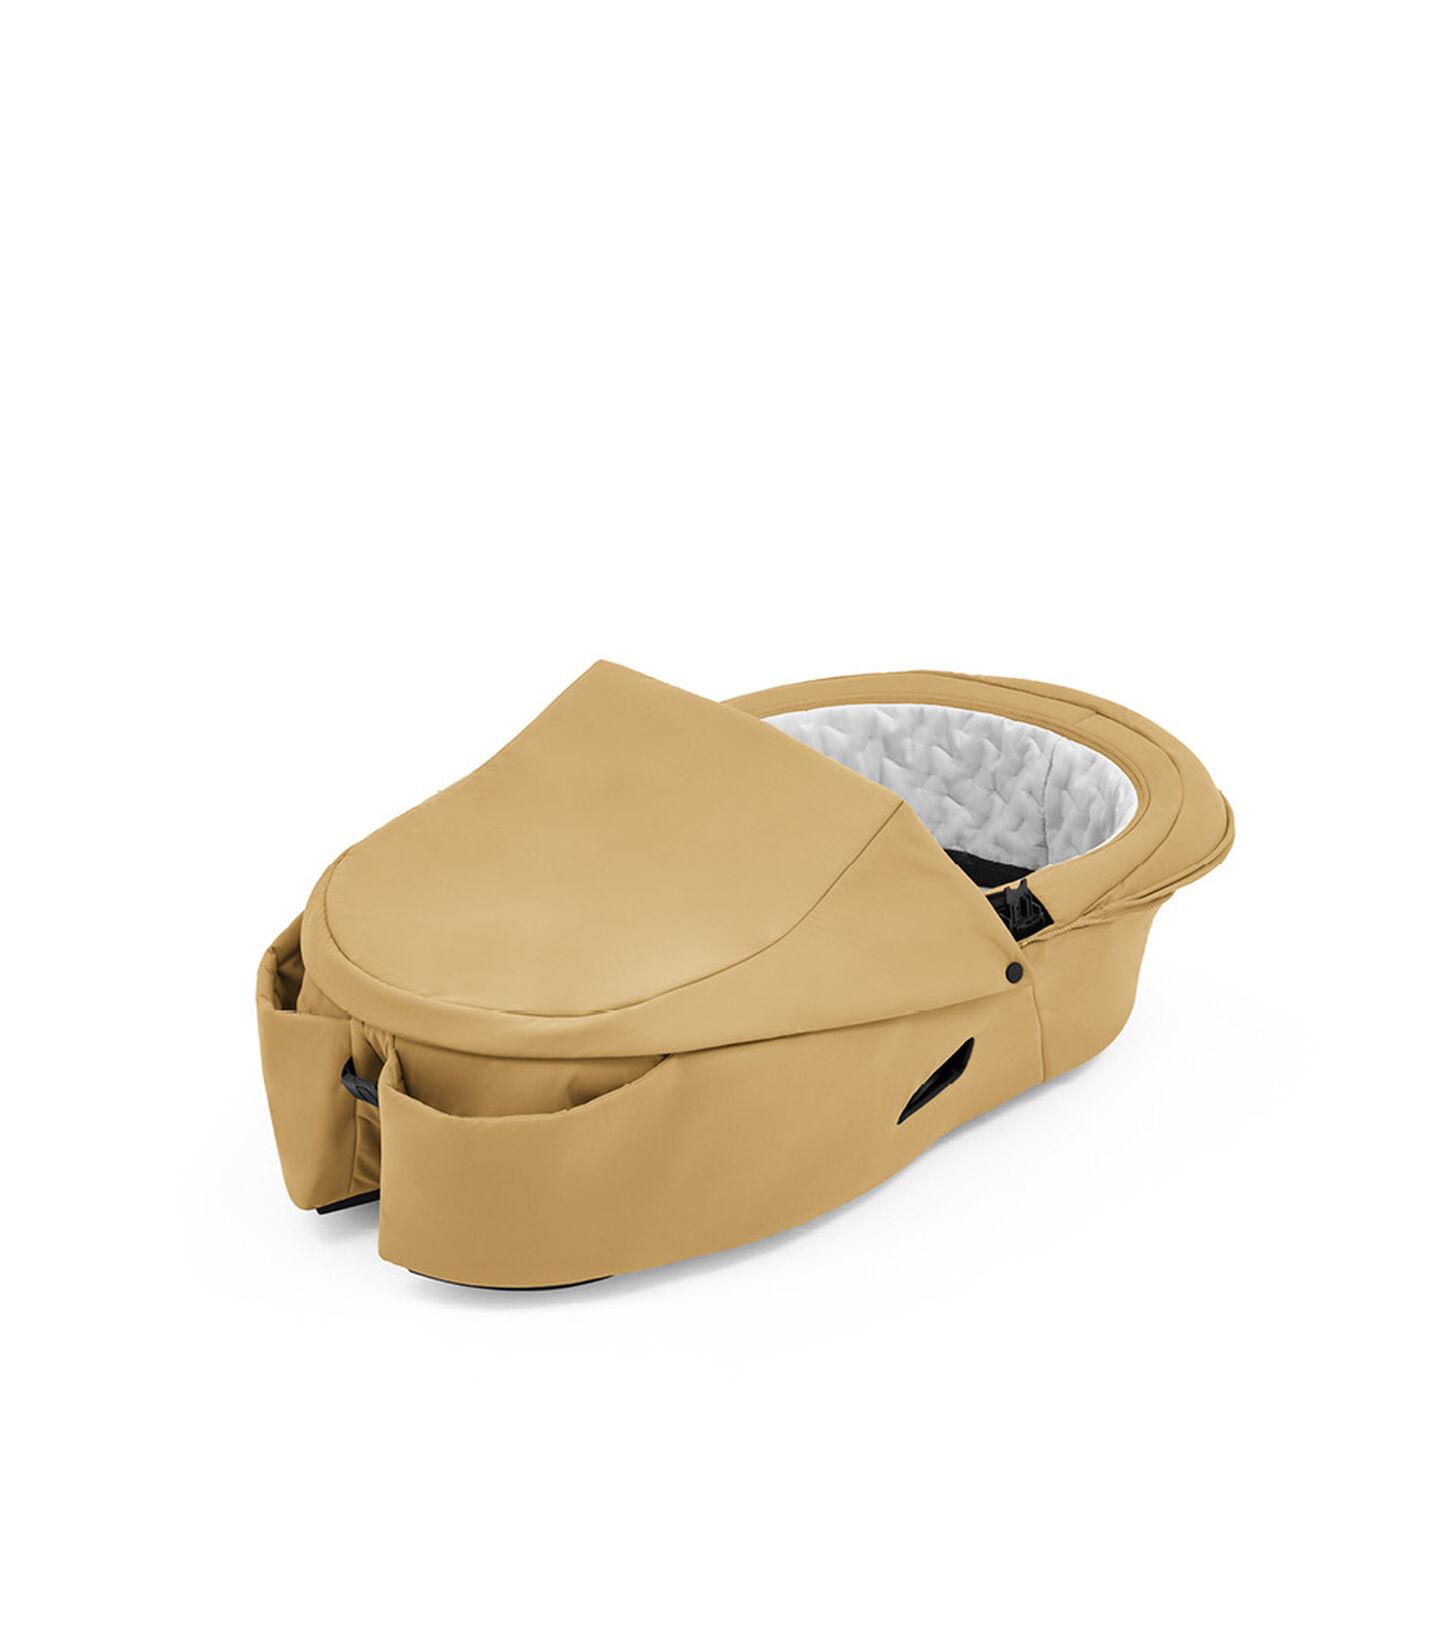 Stokke® Xplory® X Babyschale Golden Yellow, Golden Yellow, mainview view 1